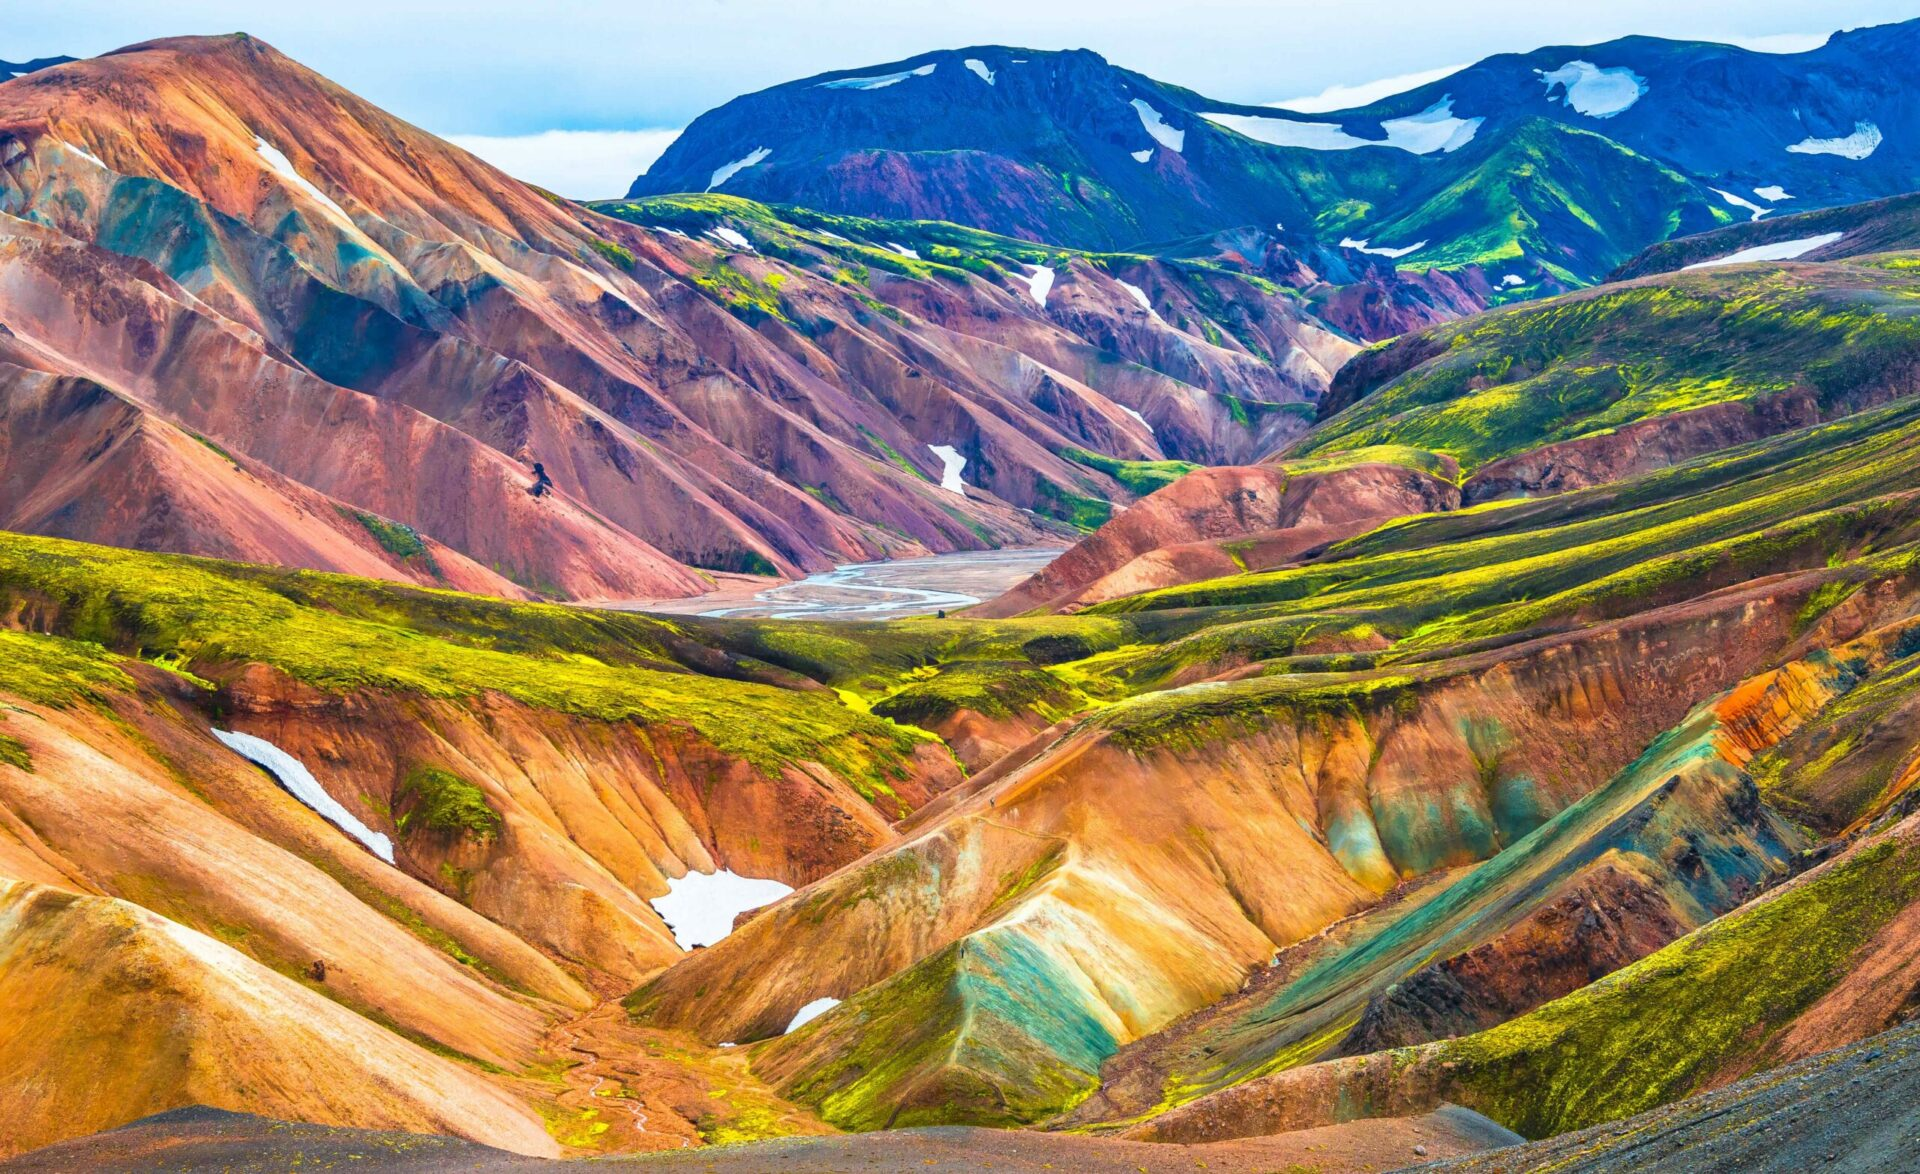 Colorful hills in Landmannalaugar in the highlands of Iceland, Brennisteinsalda Mountain in Landmannalaugar